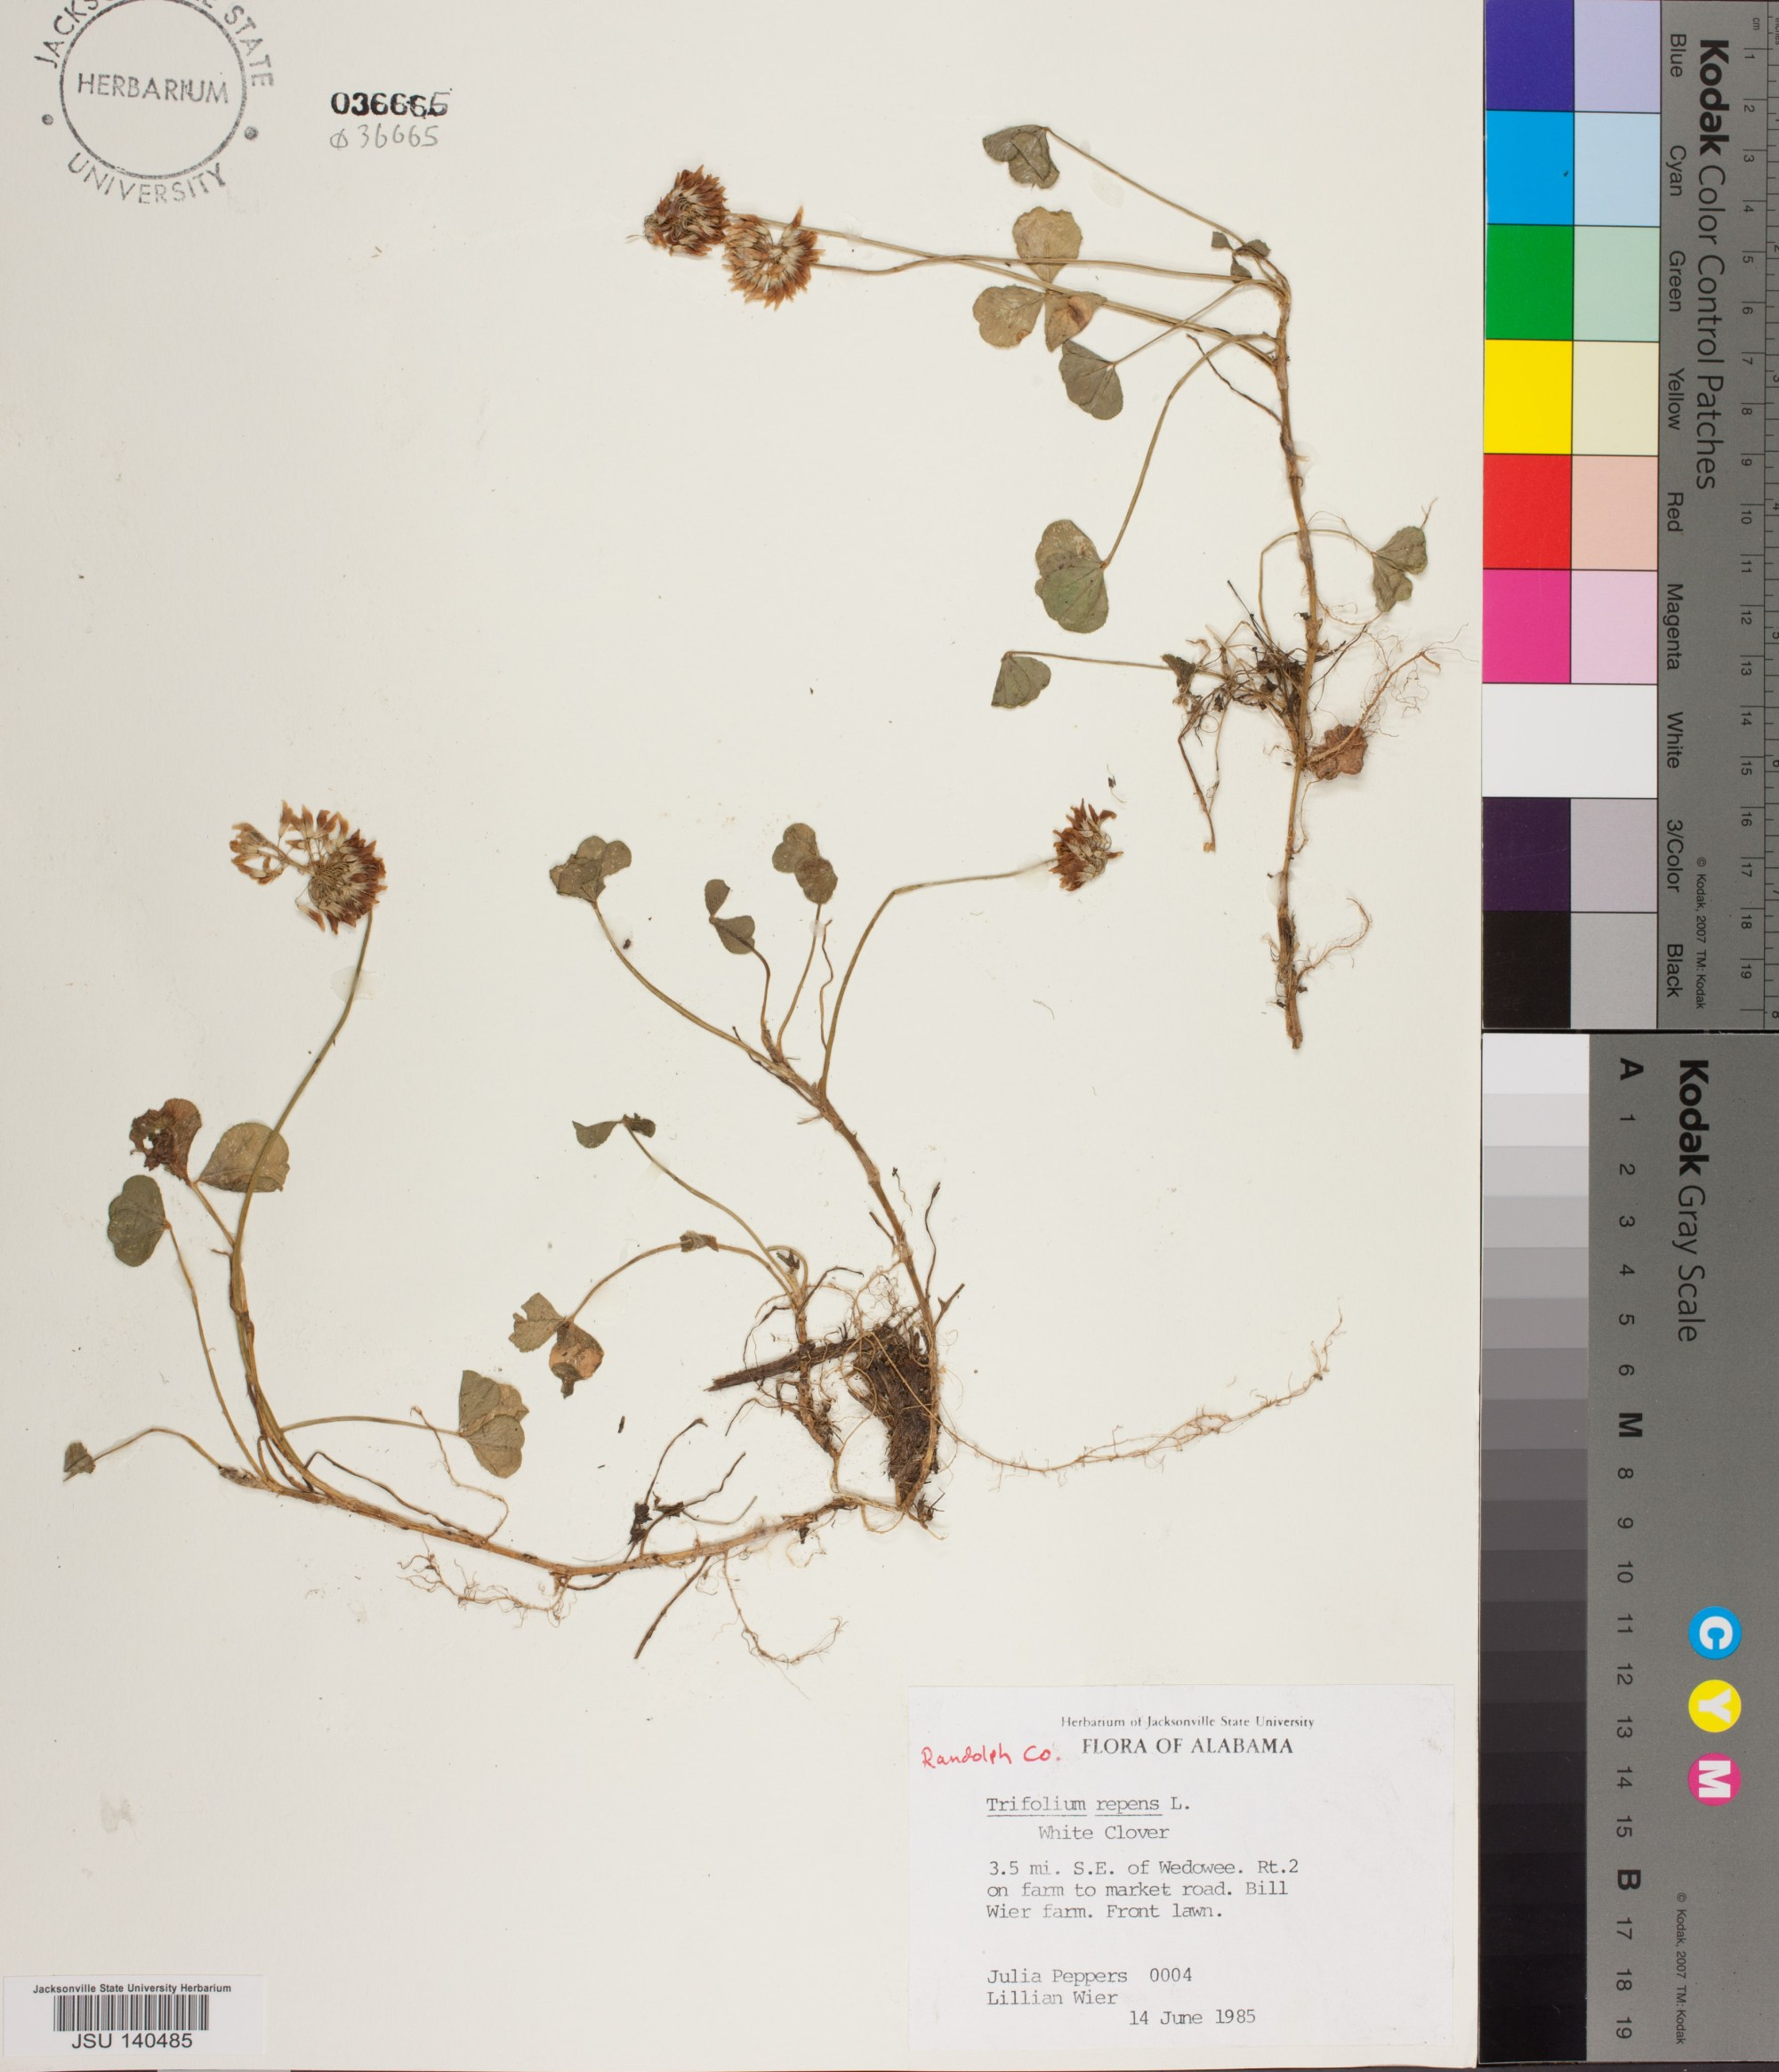 hight resolution of 0004 jsu trifolium repens linnaeus